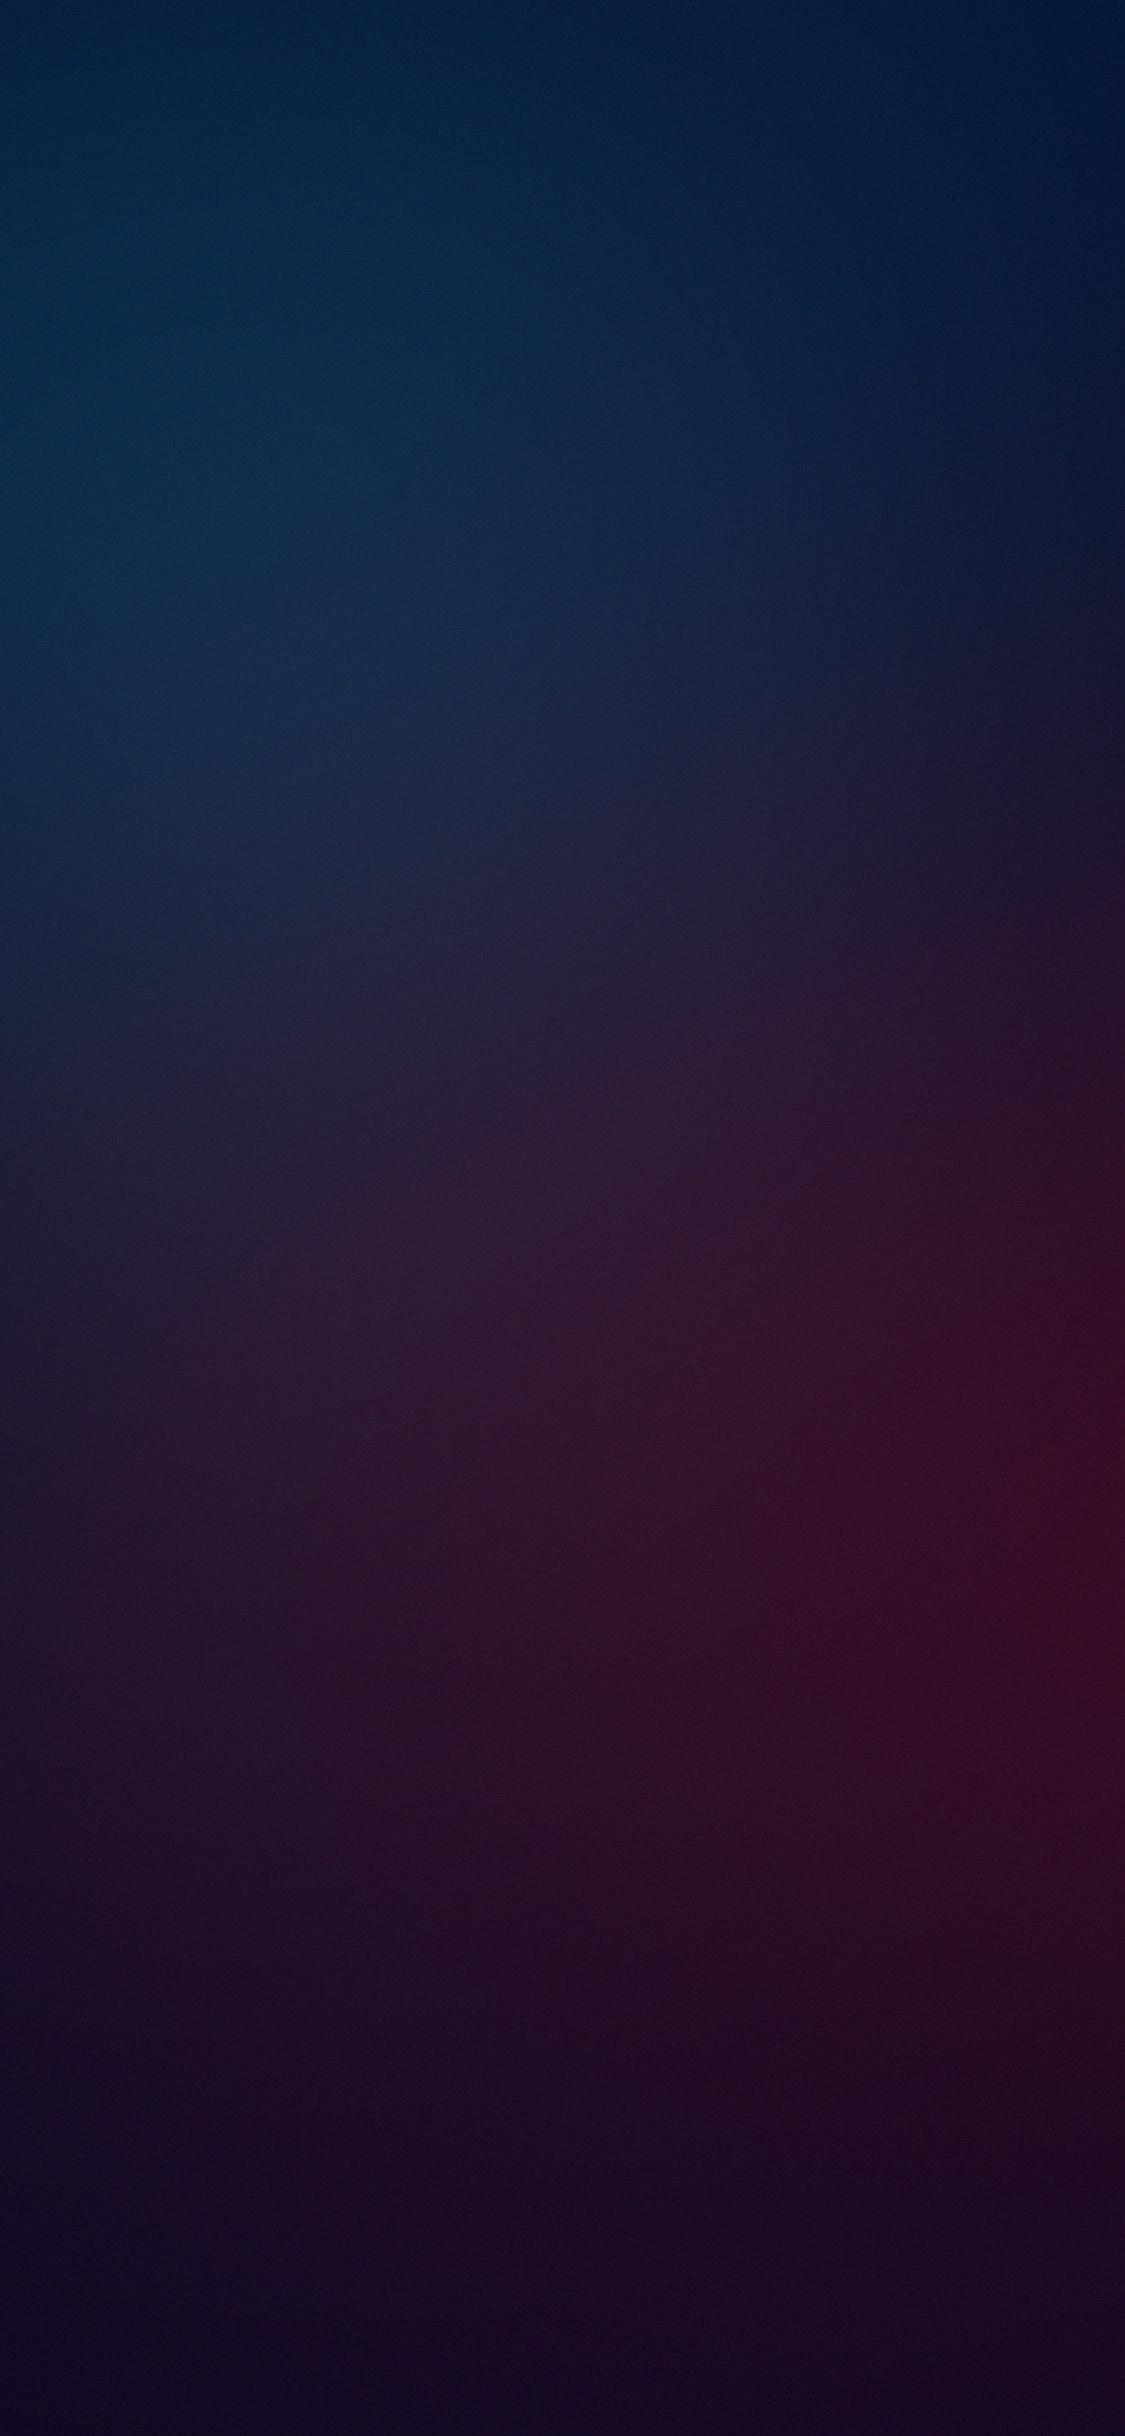 1125x2436 Dark Blur Abstract 4k Iphone Xs Iphone 10 Iphone X